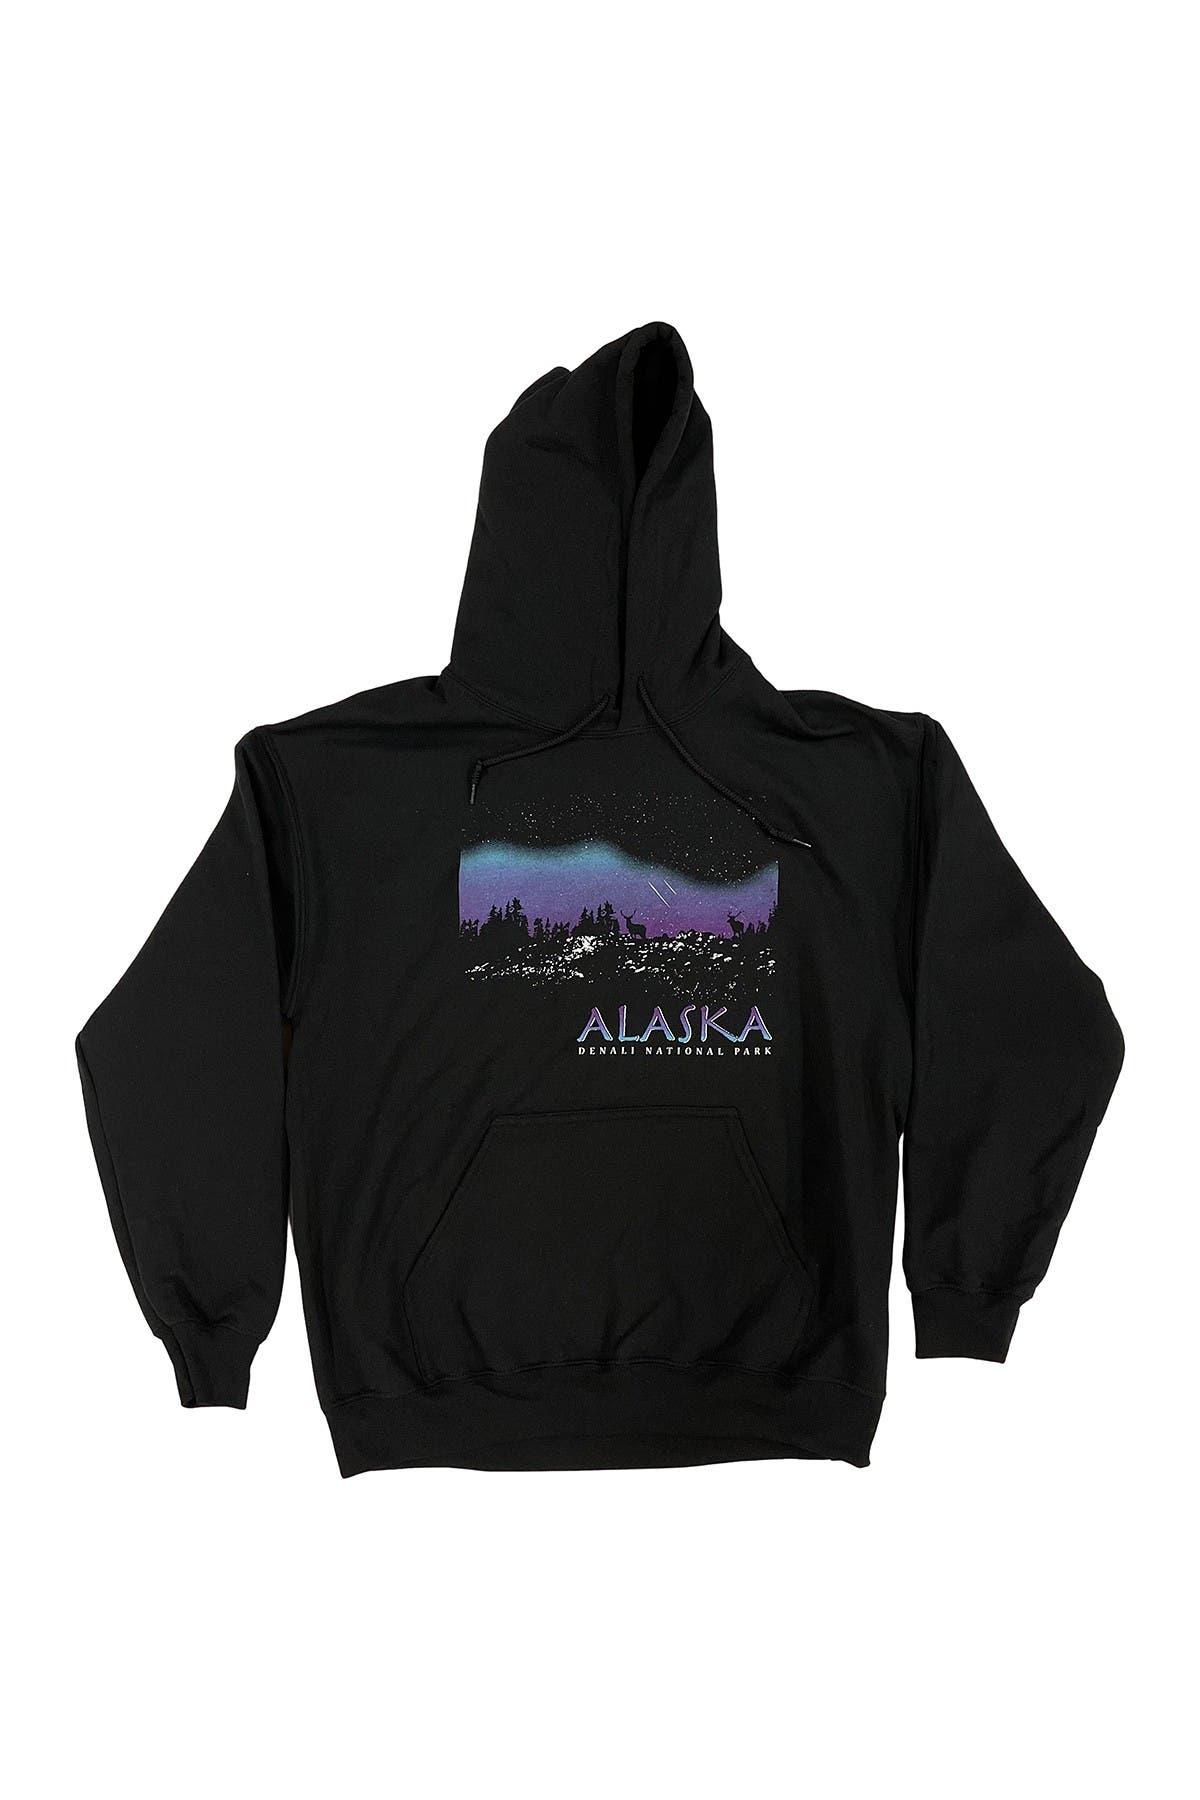 Image of Body Rags Denali National Park Alaska Night Sky Pullover Hoodie